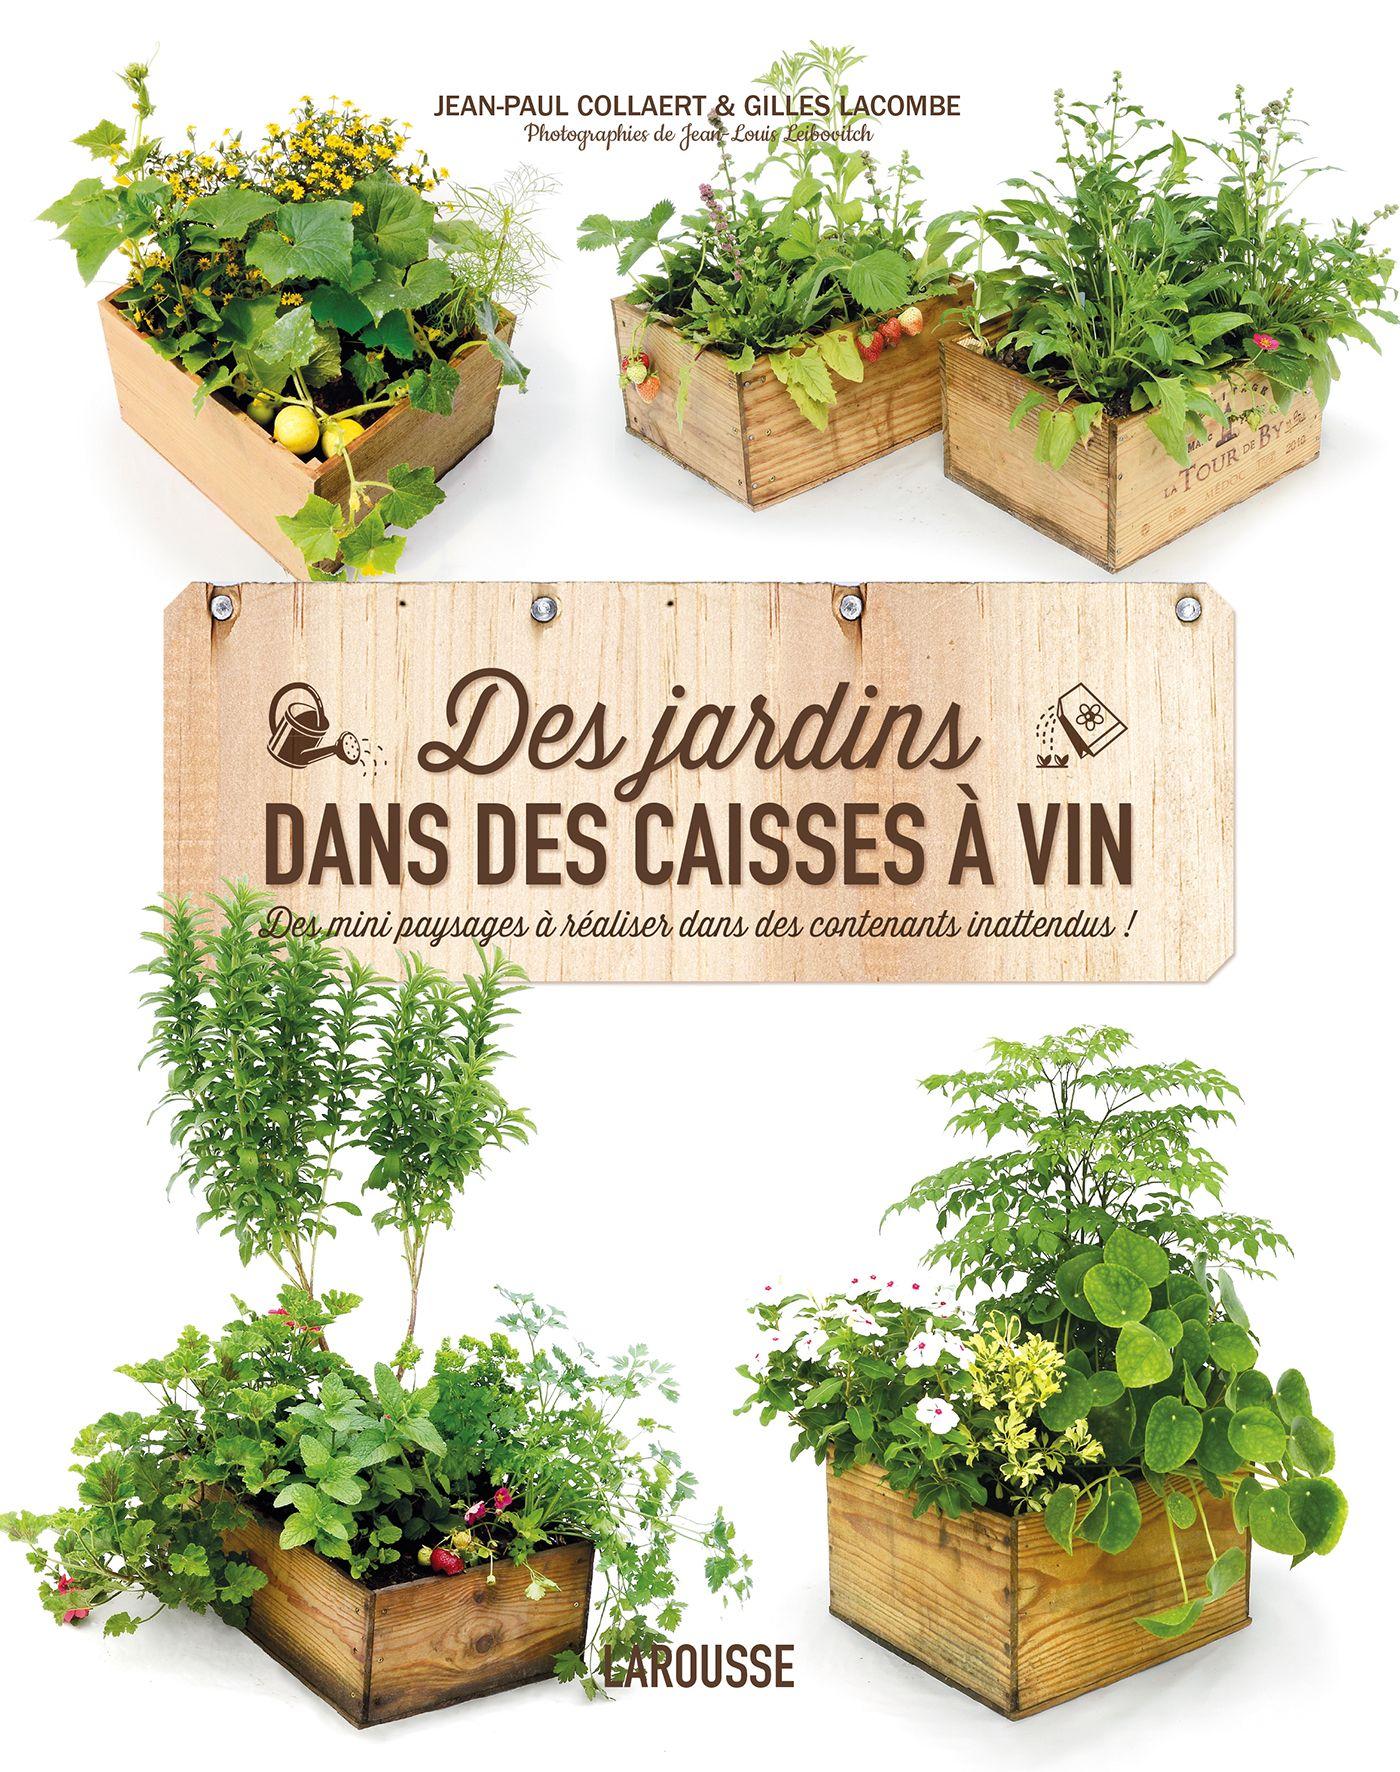 24171f3b45efaef66c75556c7da7f98e Unique De Faire Un Jardin Concept